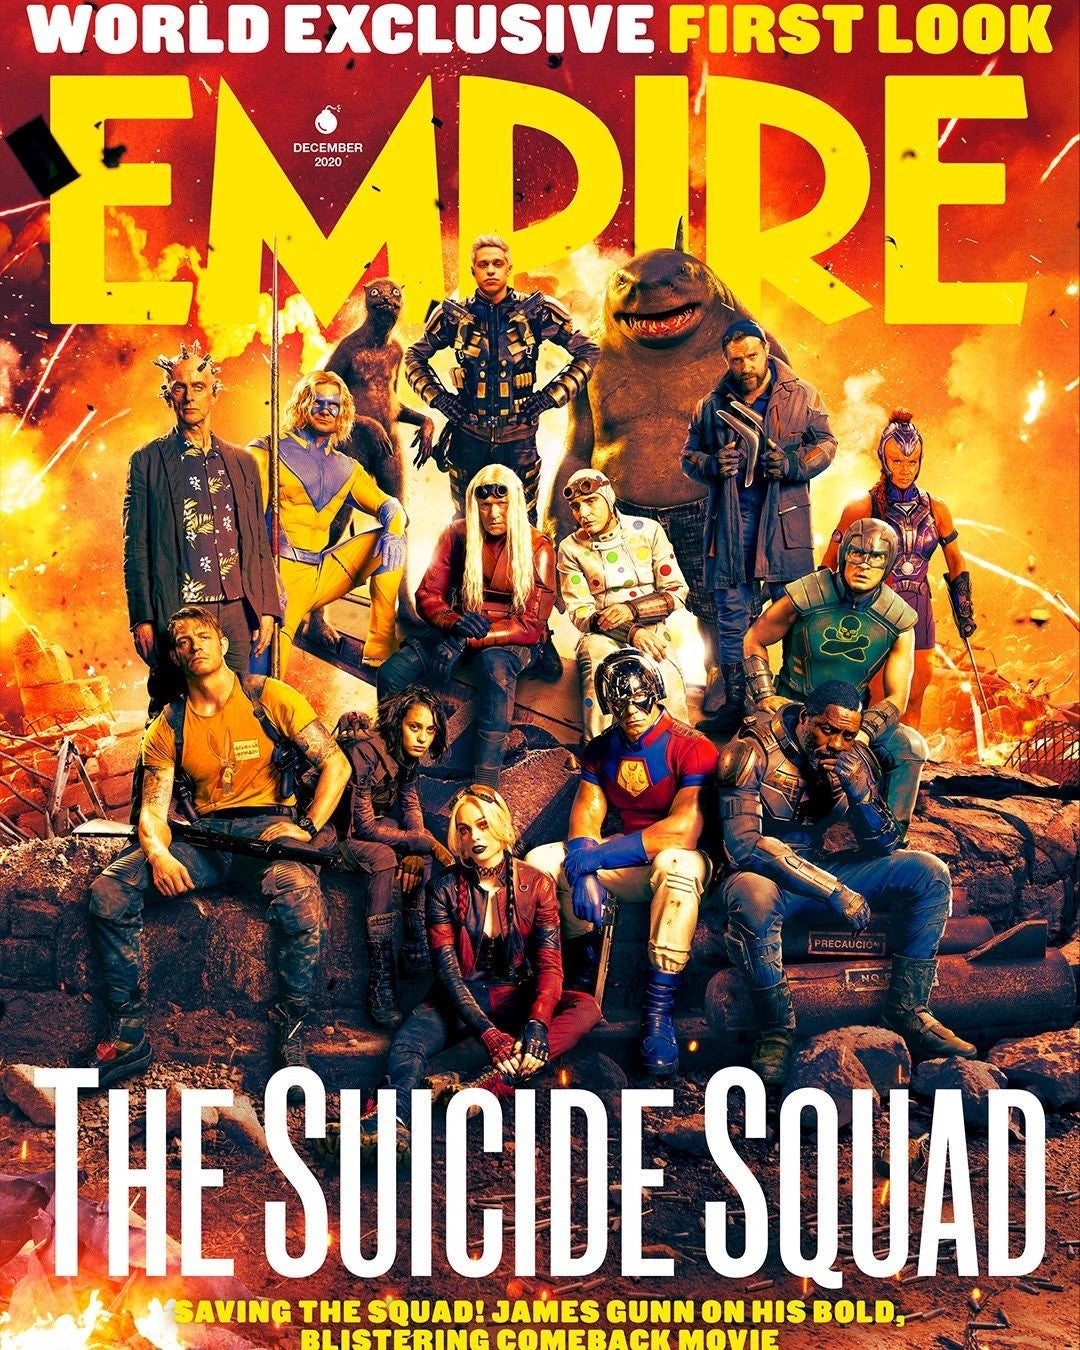 THe Suicide Squad Magazine Cover